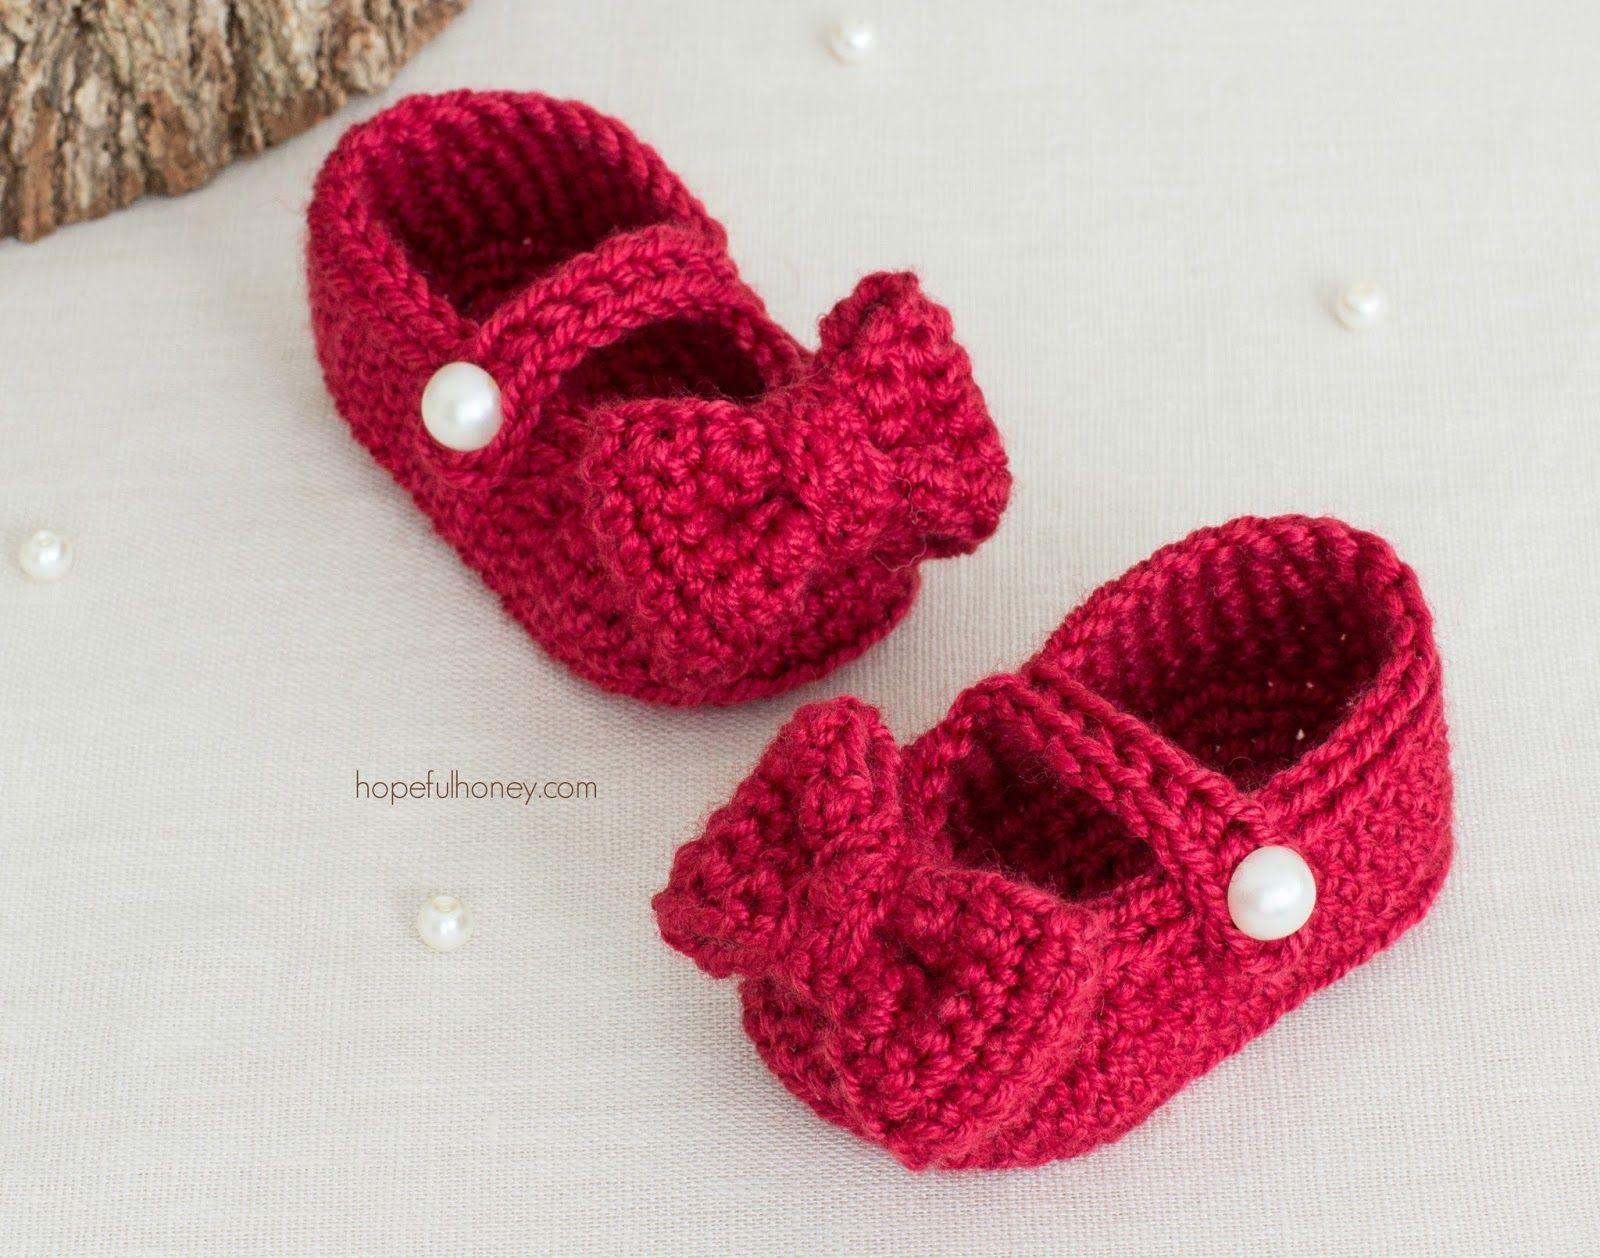 Hopeful Honey | Craft, Crochet, Create: Ruby Red Mary Jane Booties ...